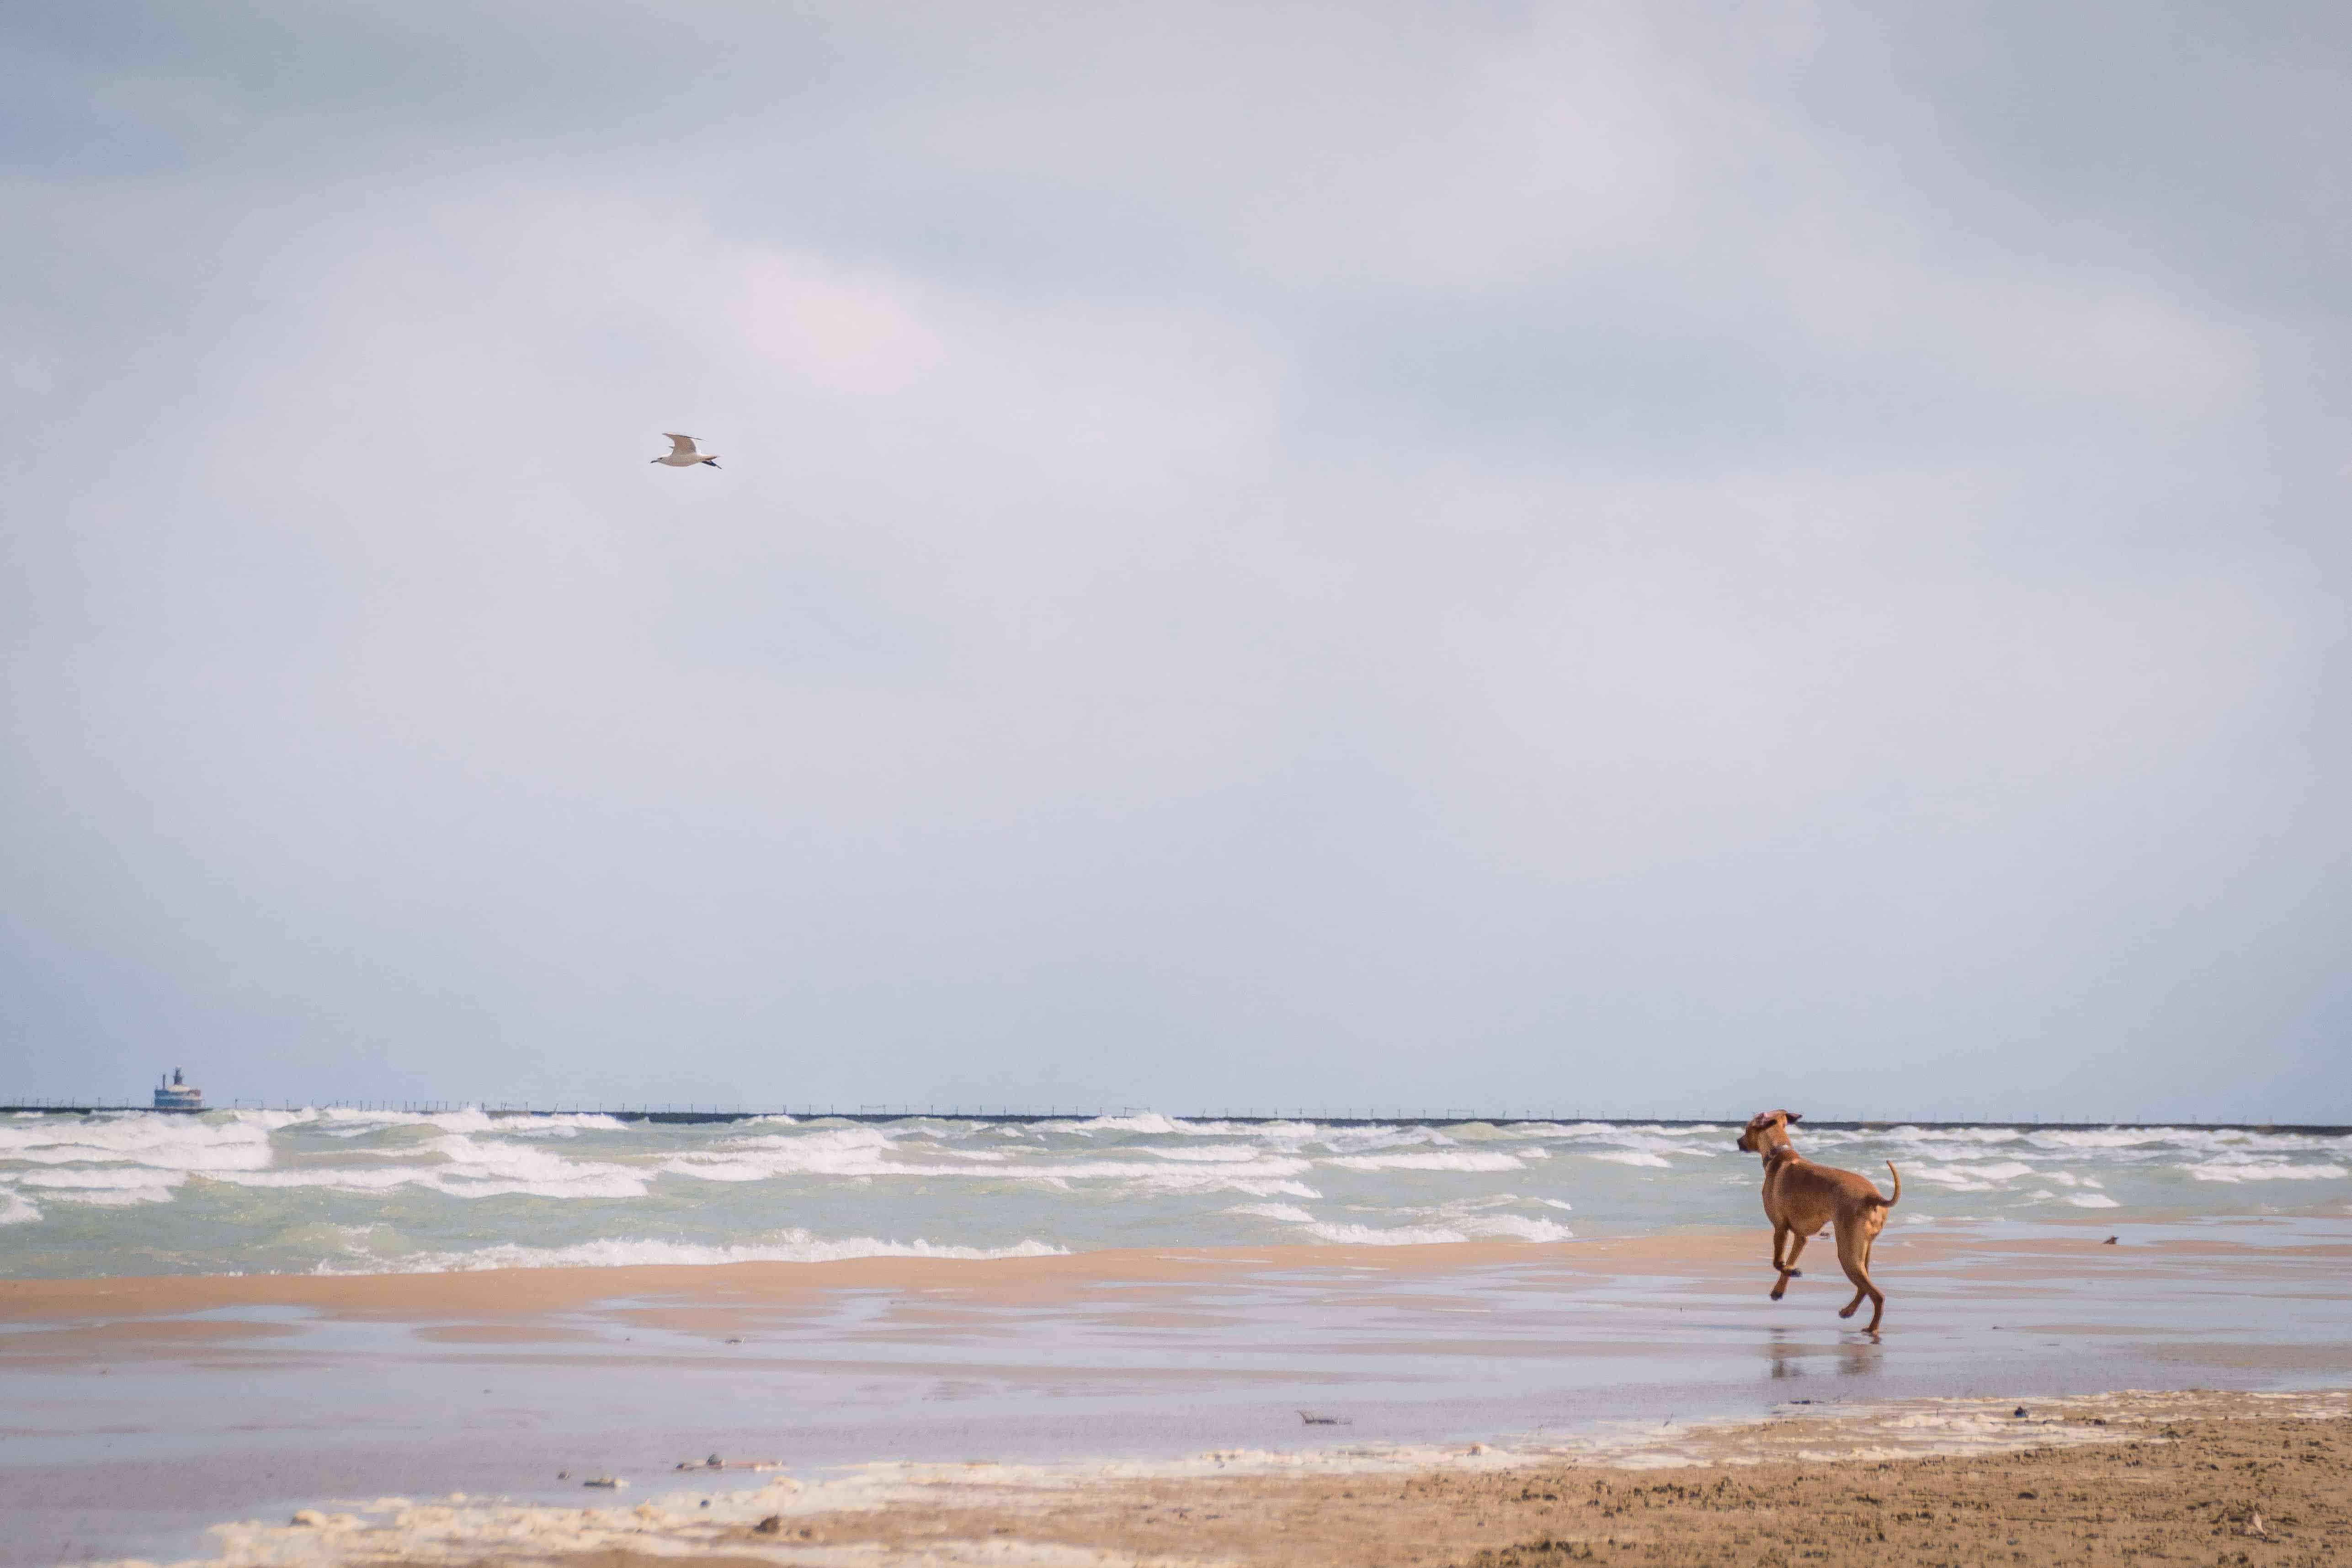 Rhodesian Ridgeback, puppy, montrose beach, chicago, adventure,  marking our territory